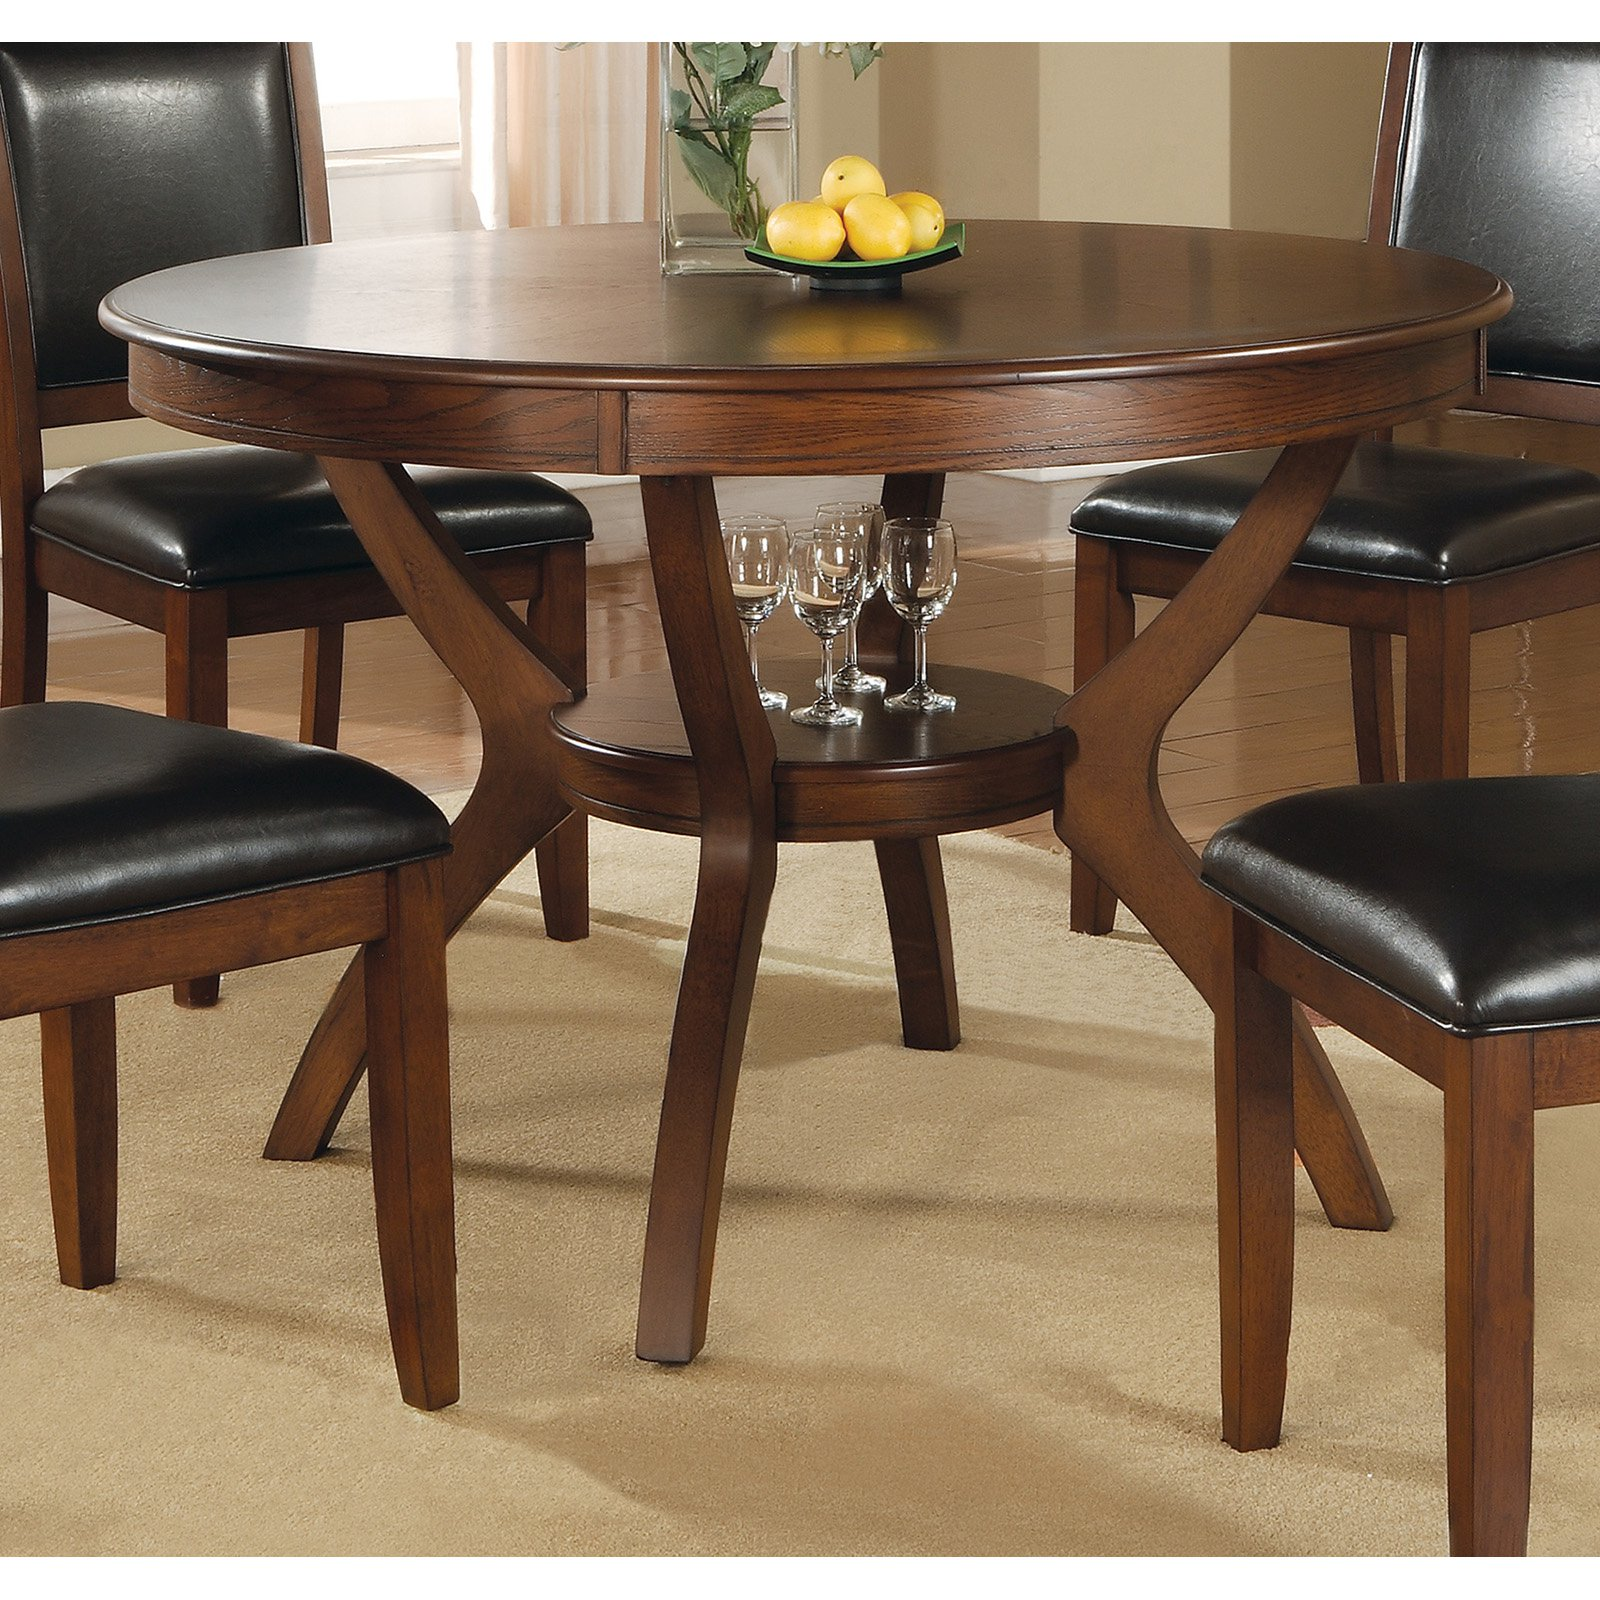 "Coaster pany 48"" Round Nelms Dining Table Deep Brown Walmart"